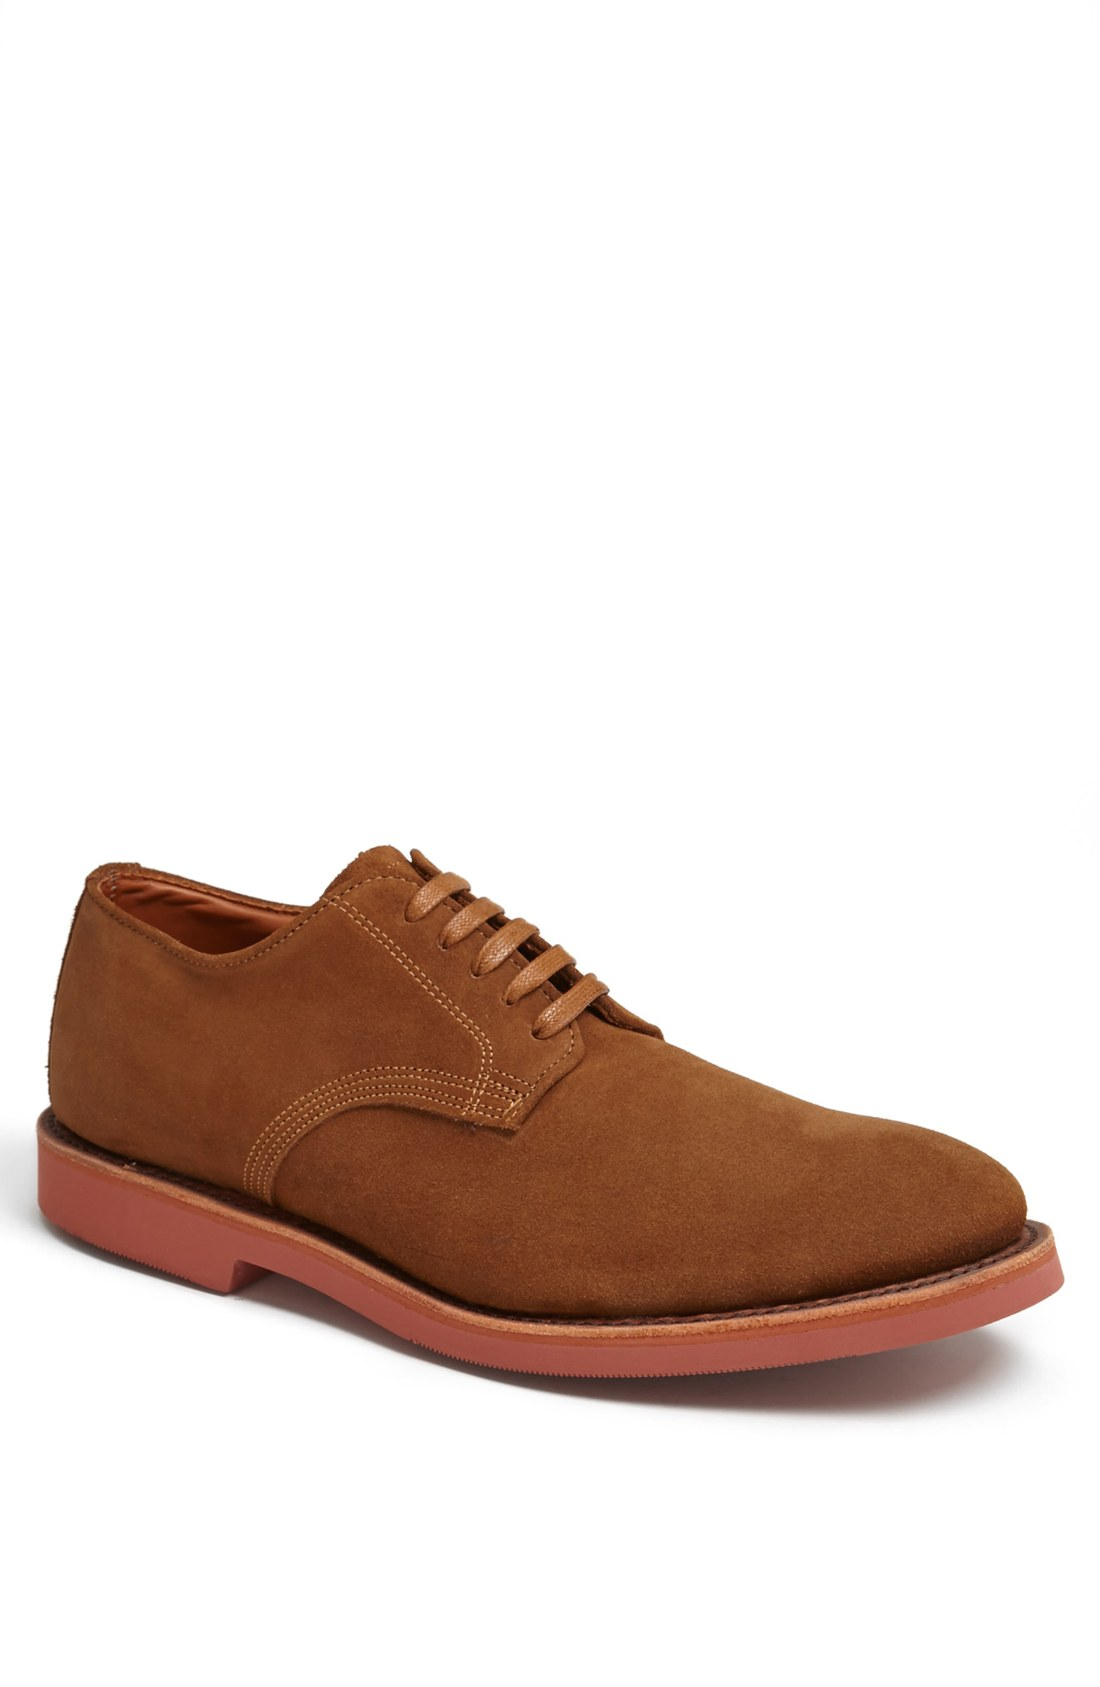 walk abram buck shoe in brown for burnt sugar